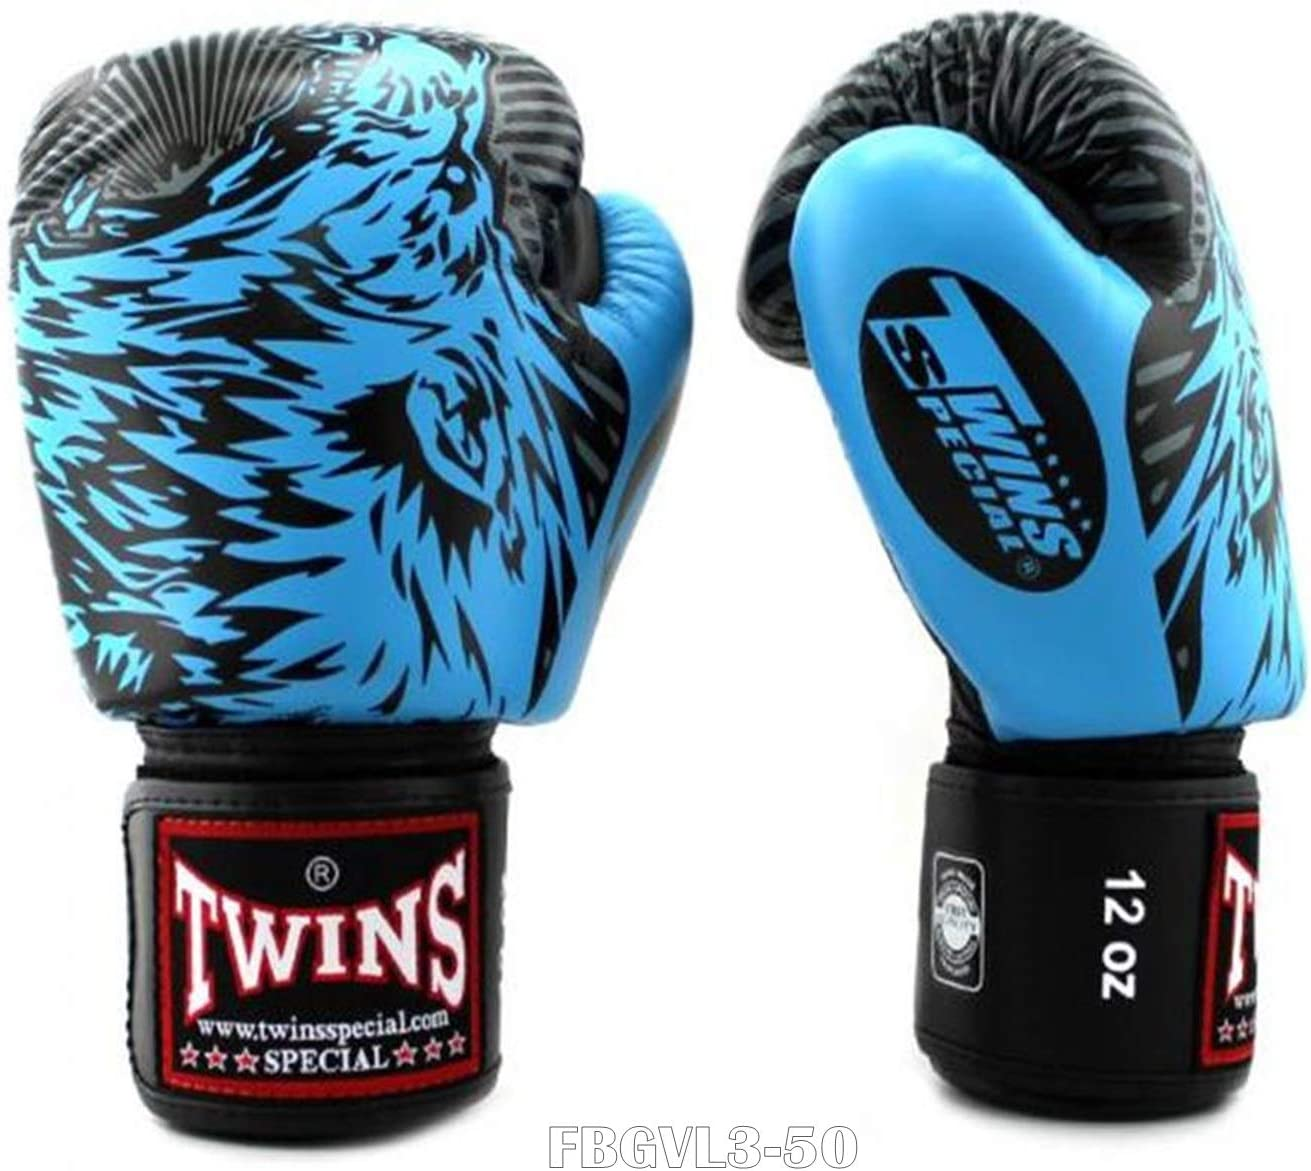 Twins New Boxing Gloves Fancy FBGVL3-50 White wolf 8,10,12,14,16 oz  MMA K1